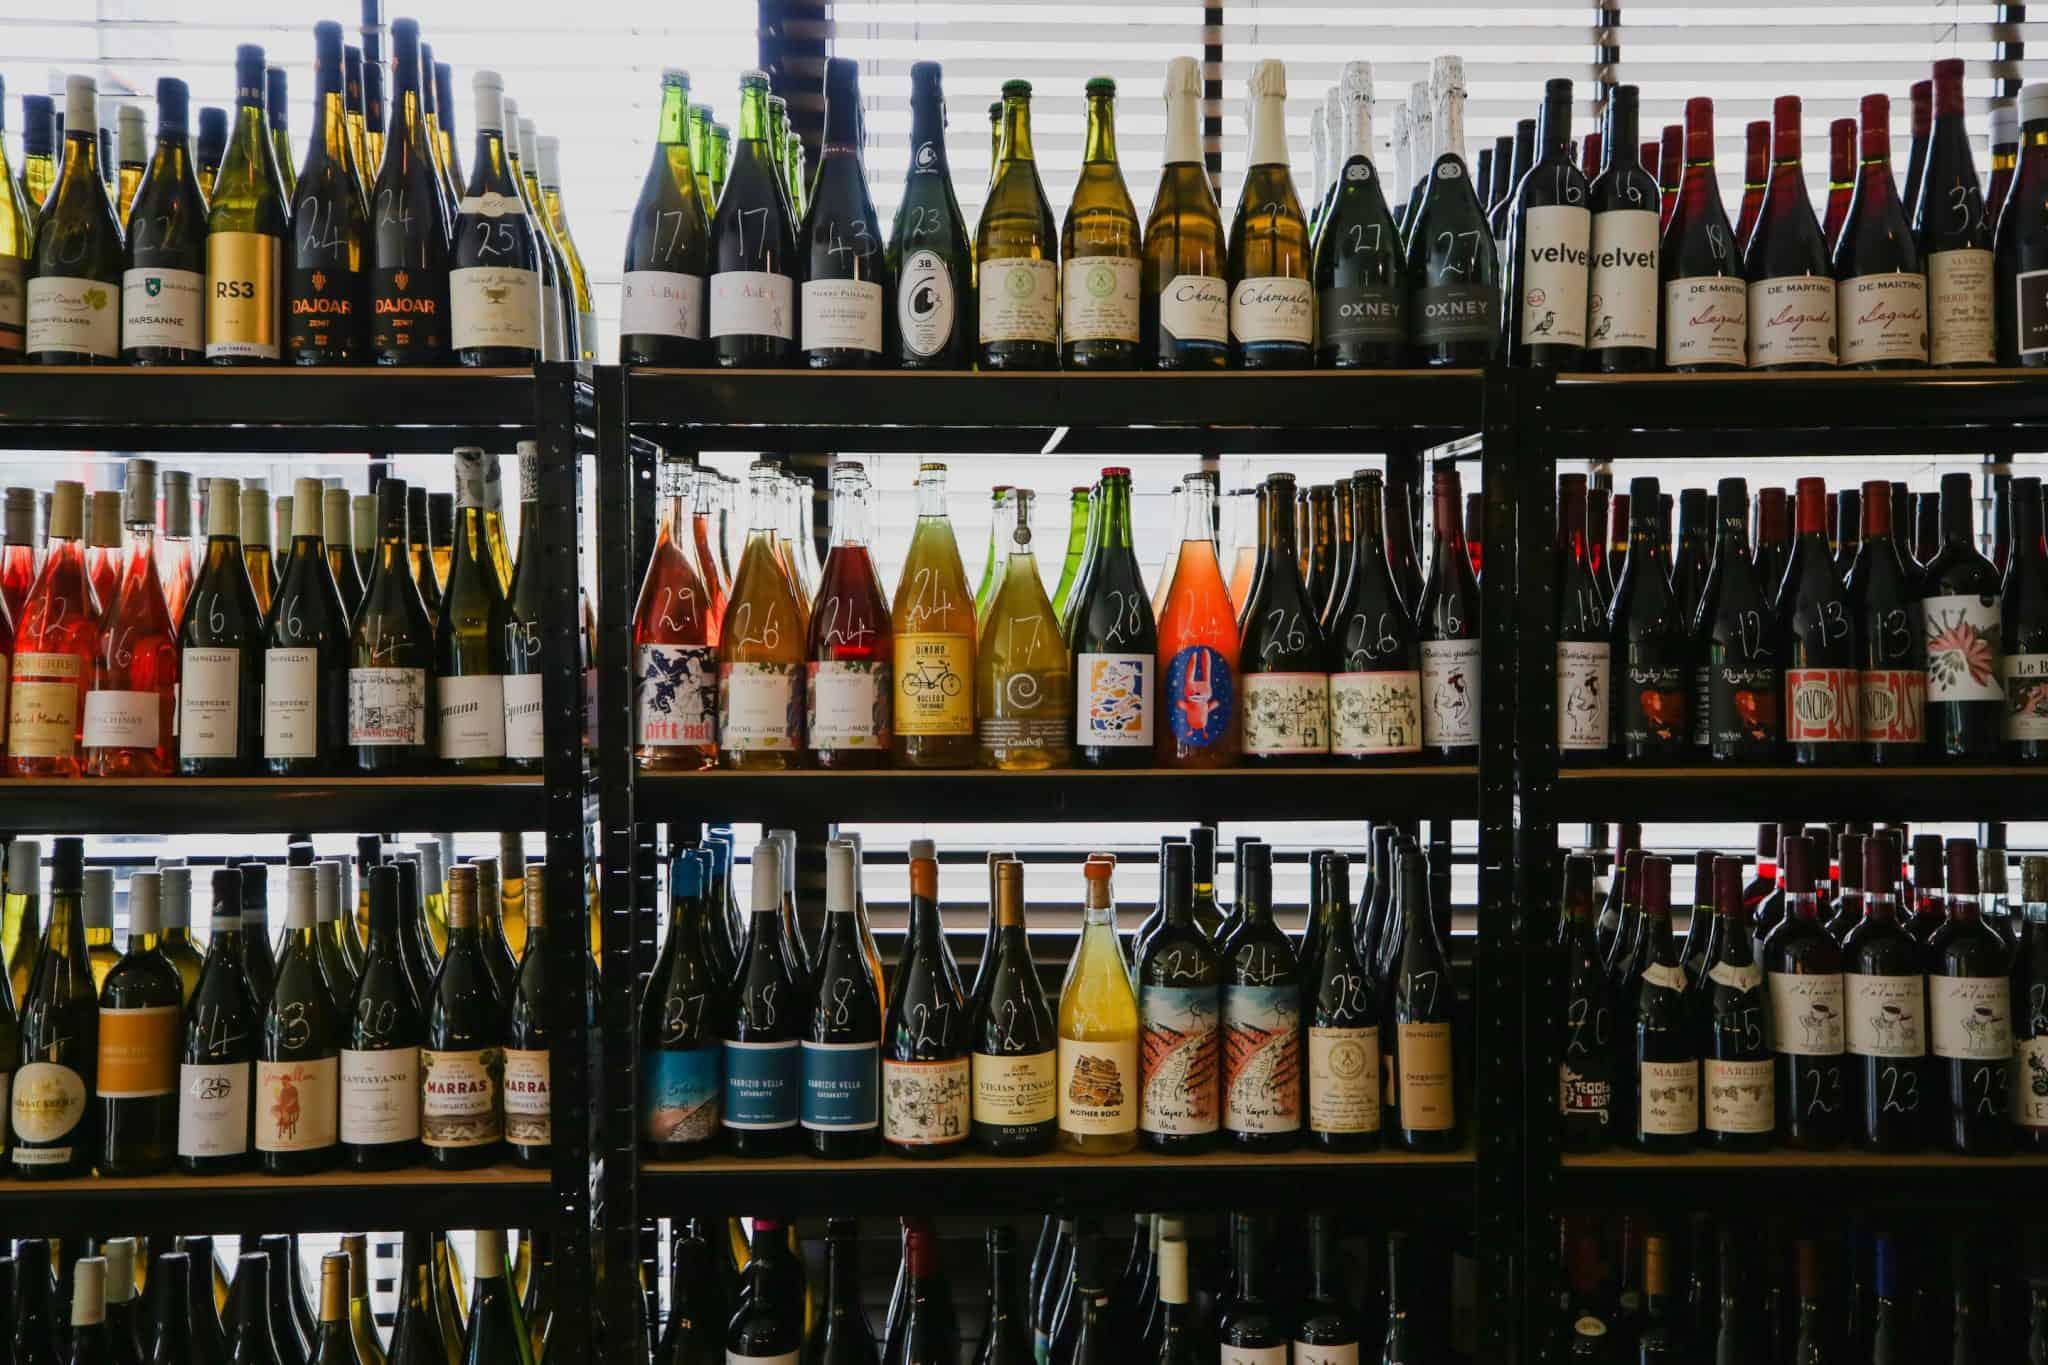 Peckham Cellars_Club Del Vino_02 (1) wine subscription